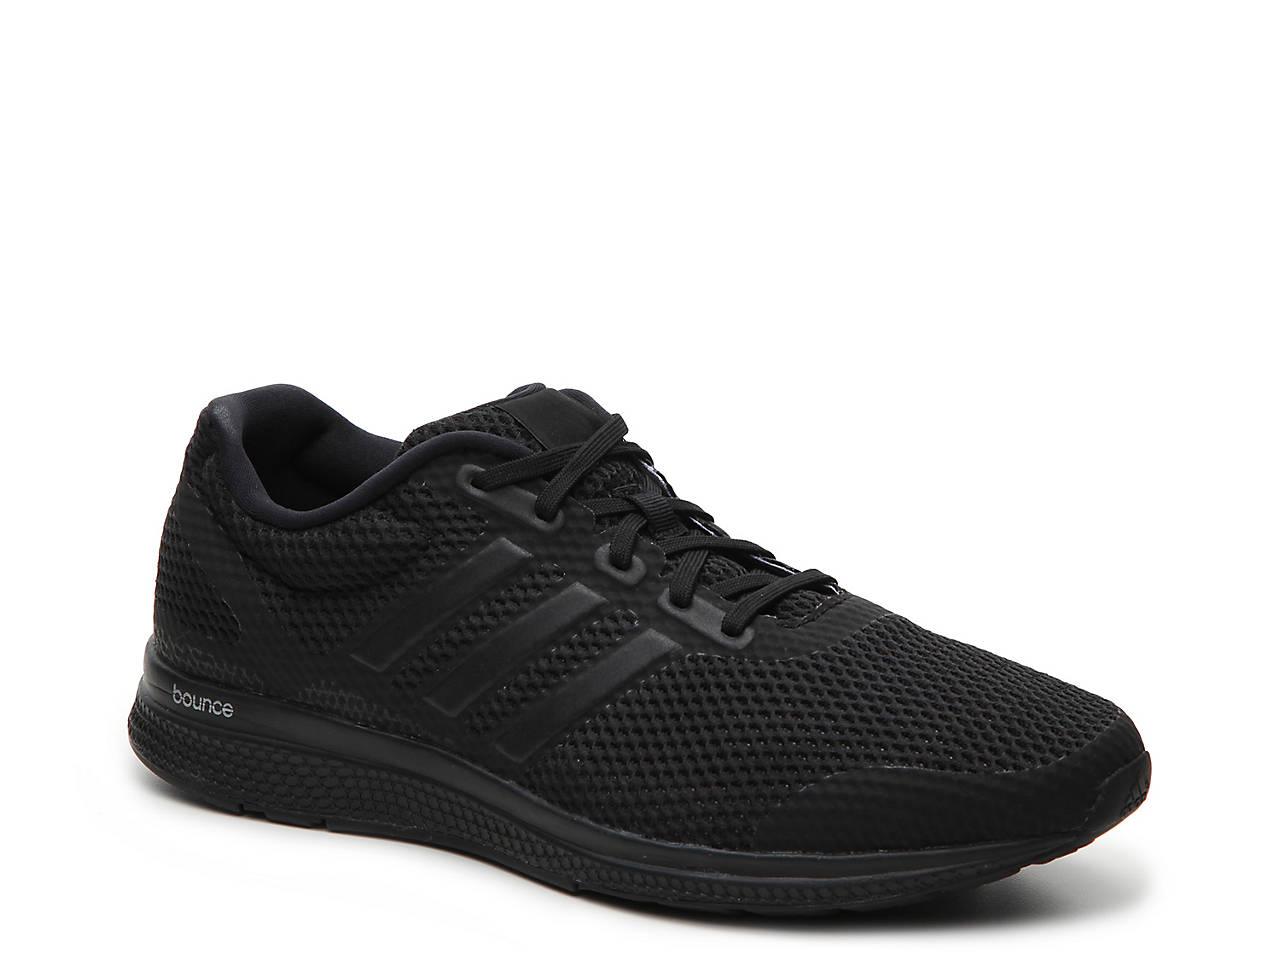 adidas mana mana adidas rimbalzare scarpa da corsa uomini scarpe da uomo dsw be9487